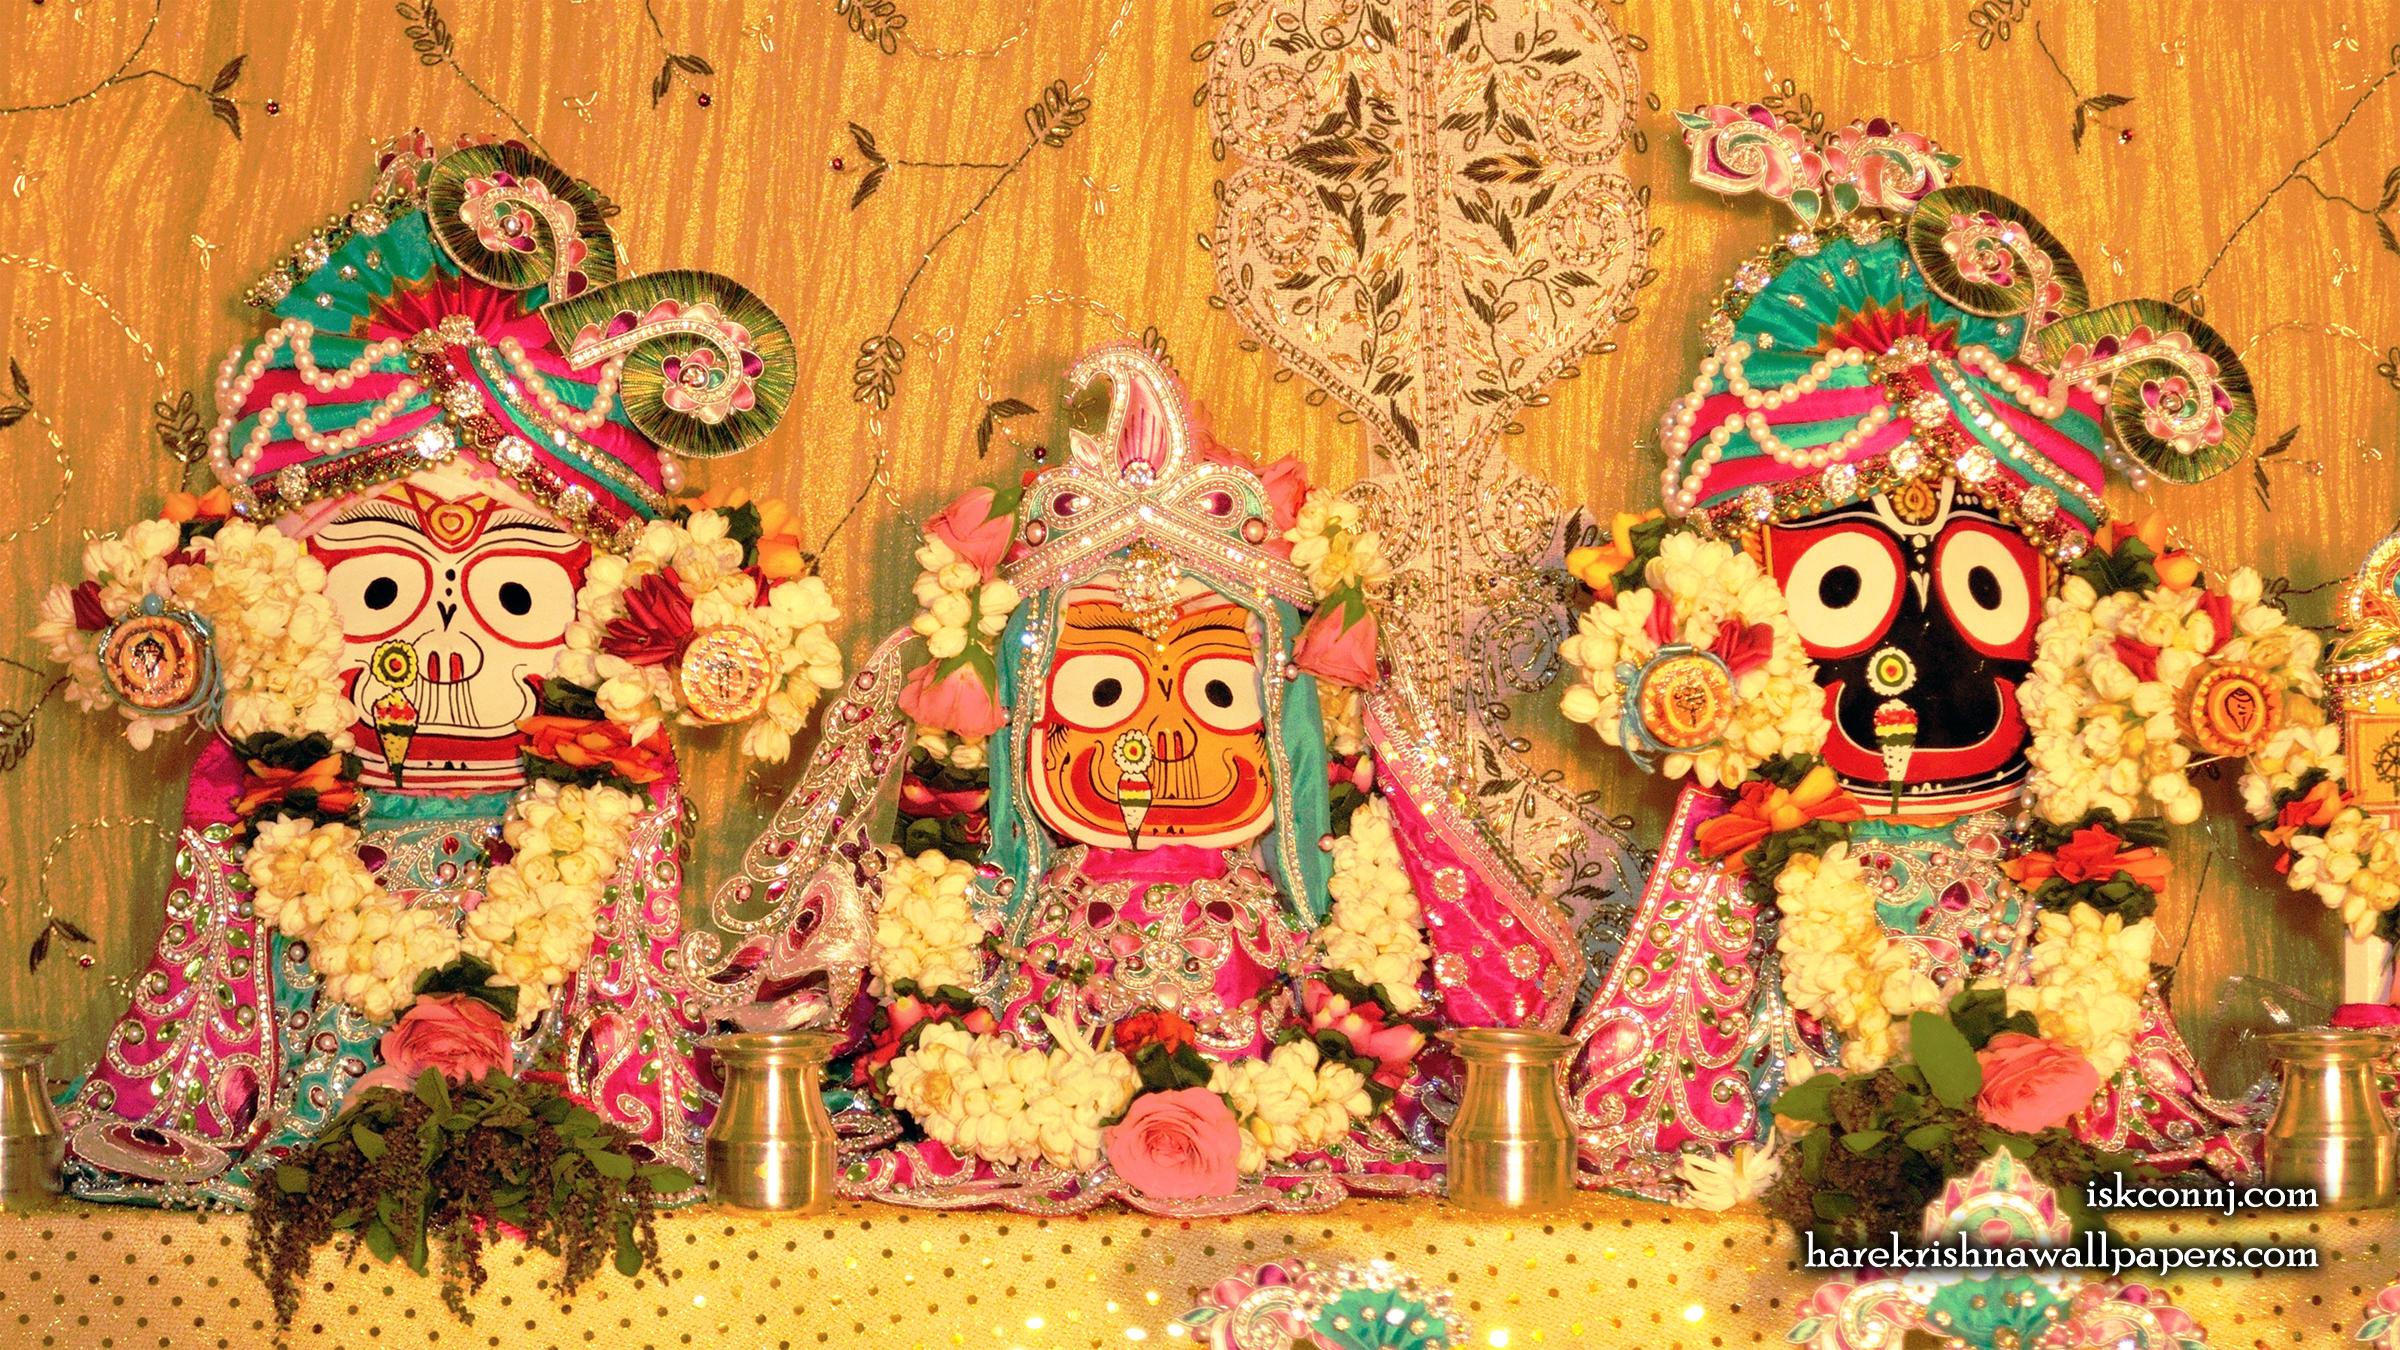 Jagannath Baladeva Subhadra Wallpaper (008) Size 2400x1350 Download